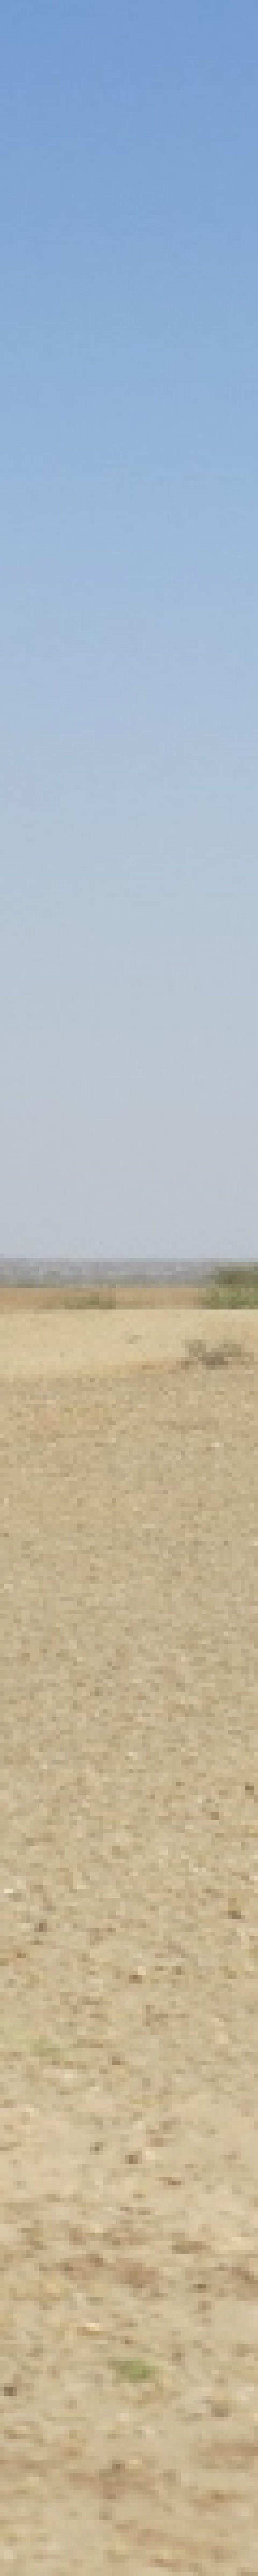 Desert dune overlooking lake Copyright Rupi Mangat